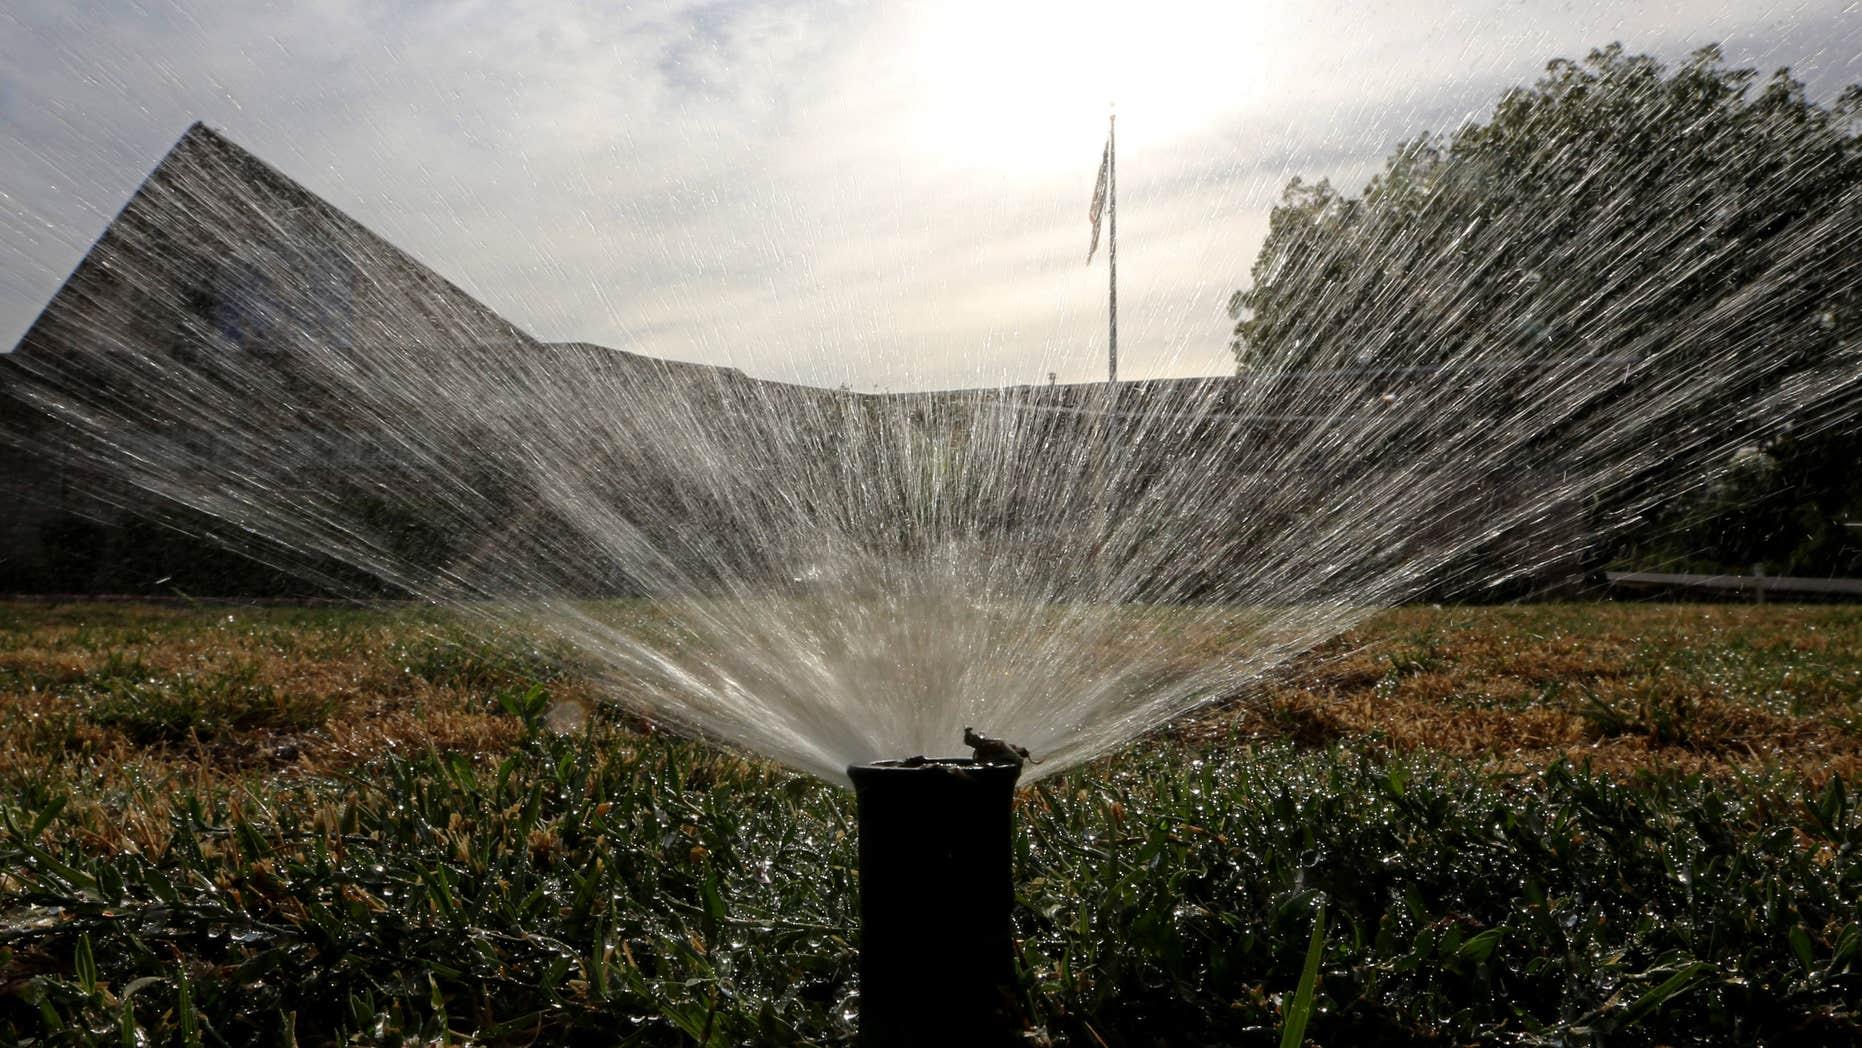 July 15, 2014: Sprinklers water a lawn in Sacramento, Calif.